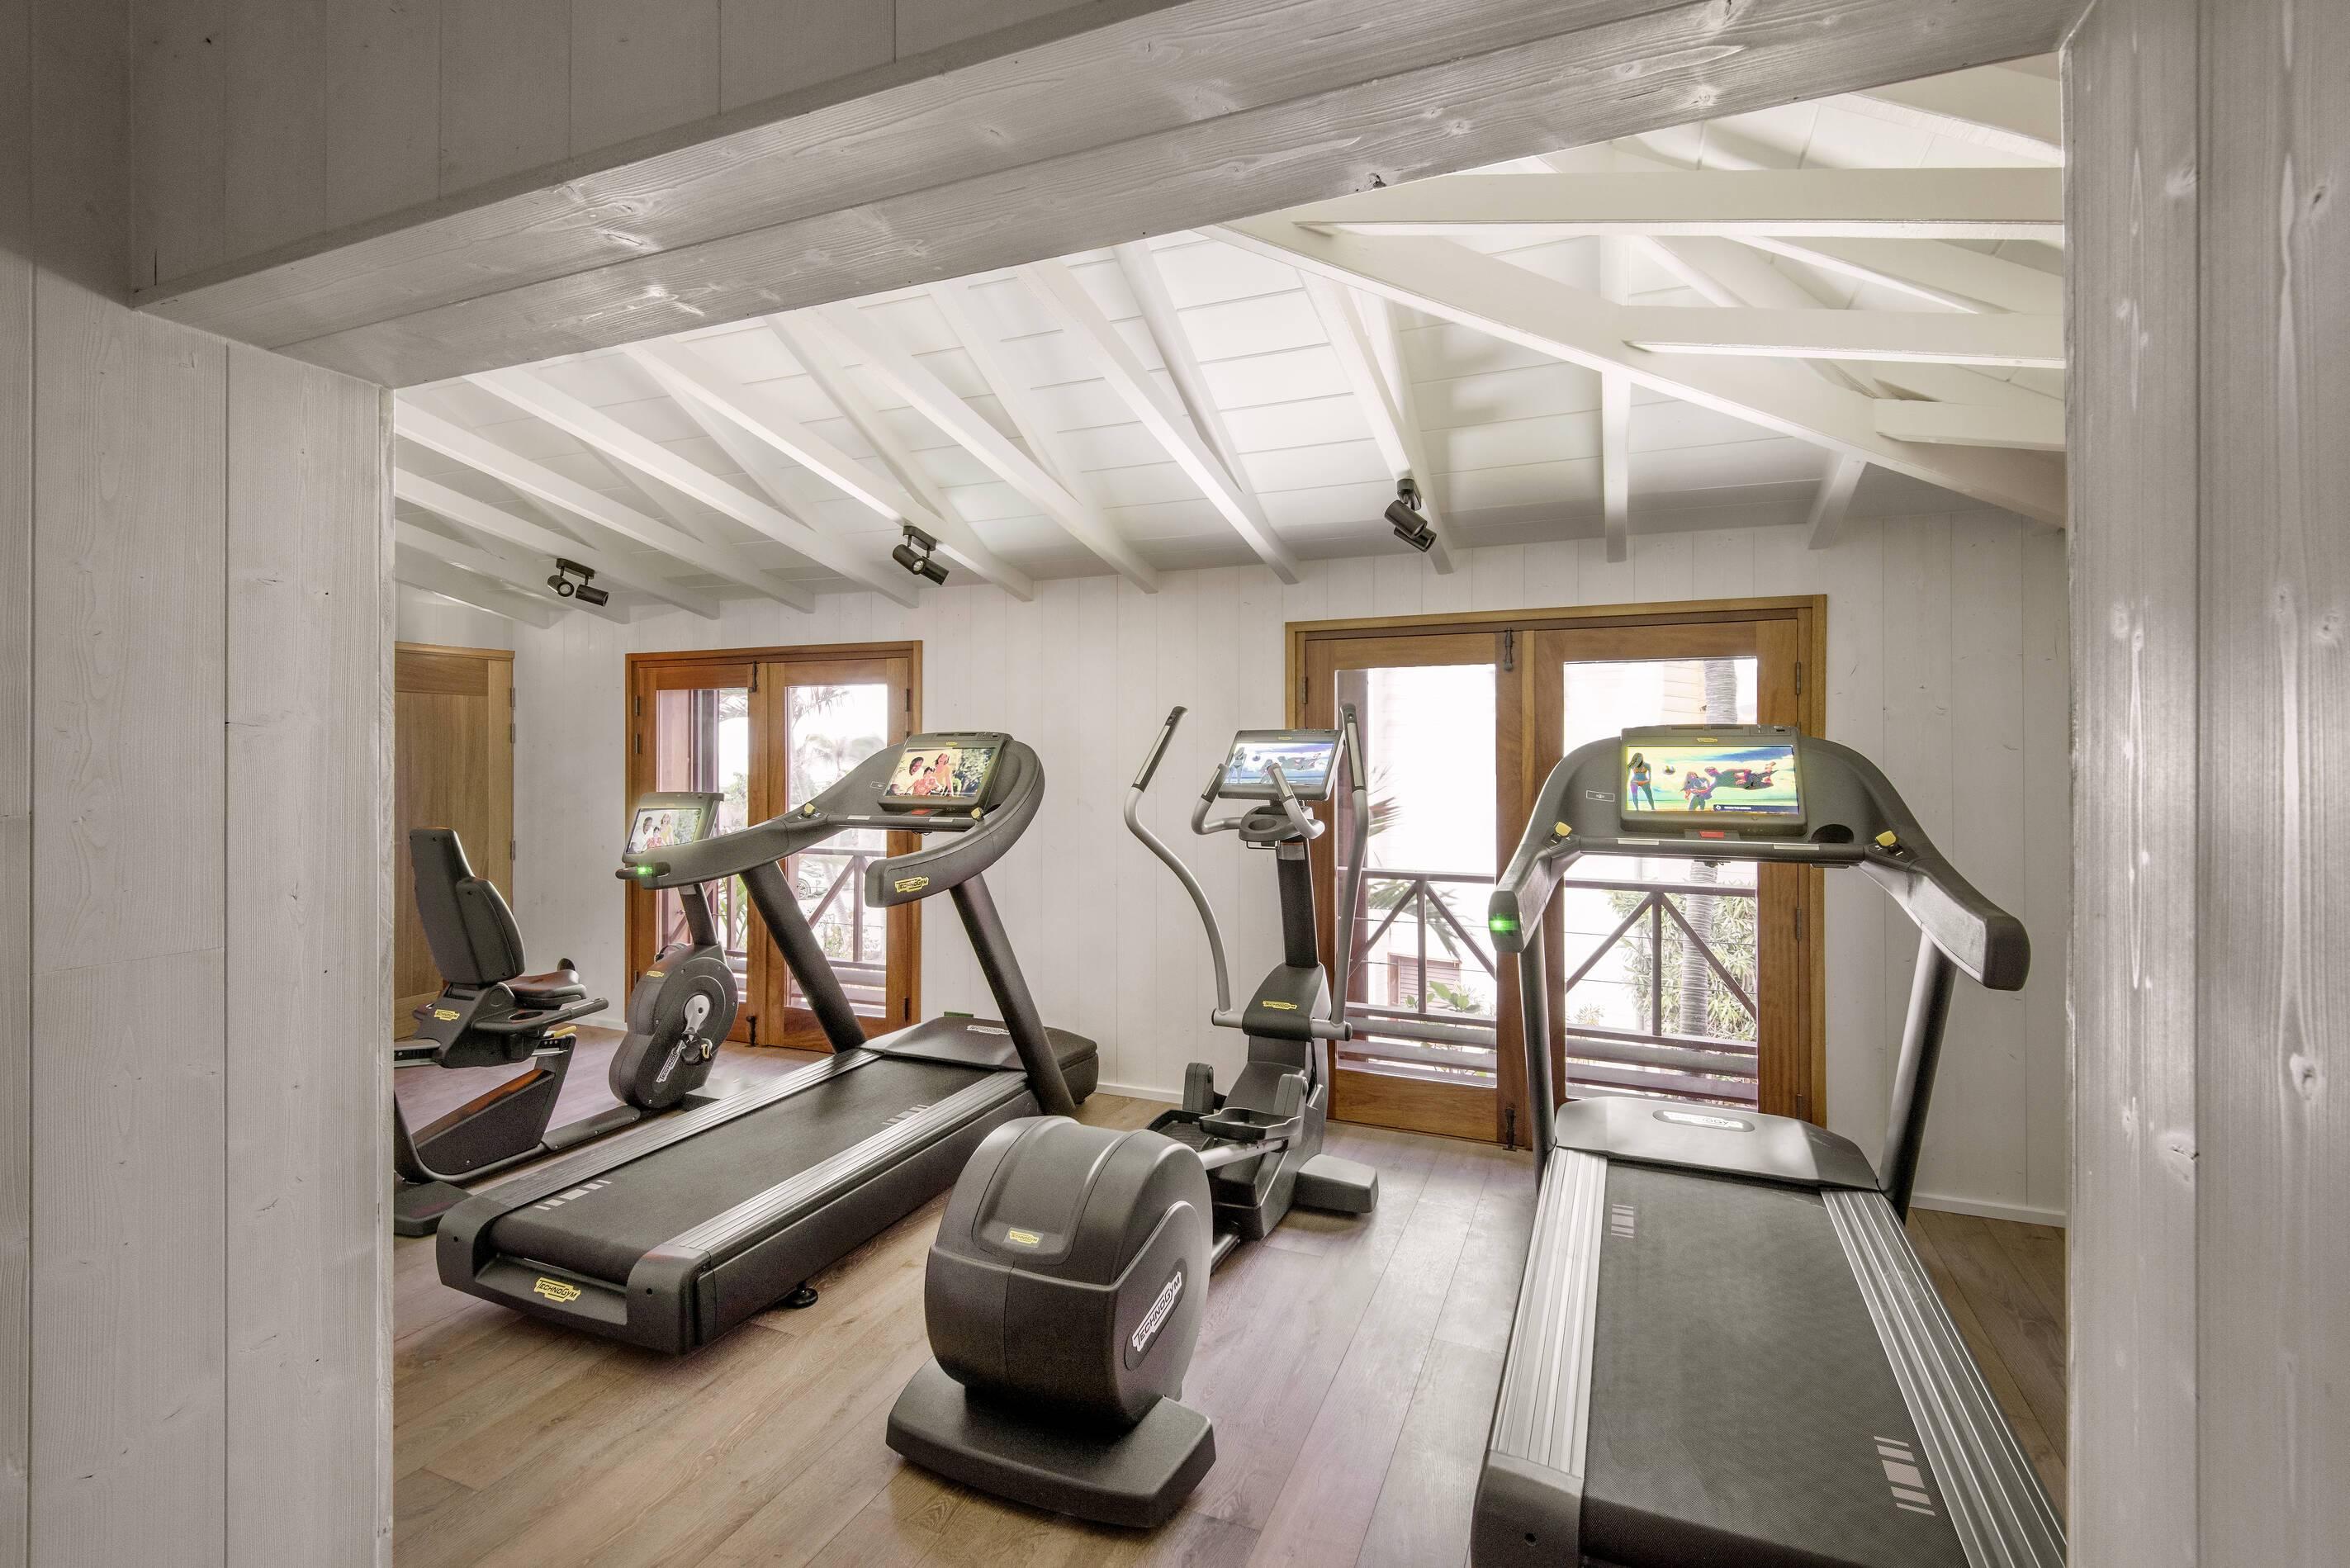 Manapany Gym Saint Barth